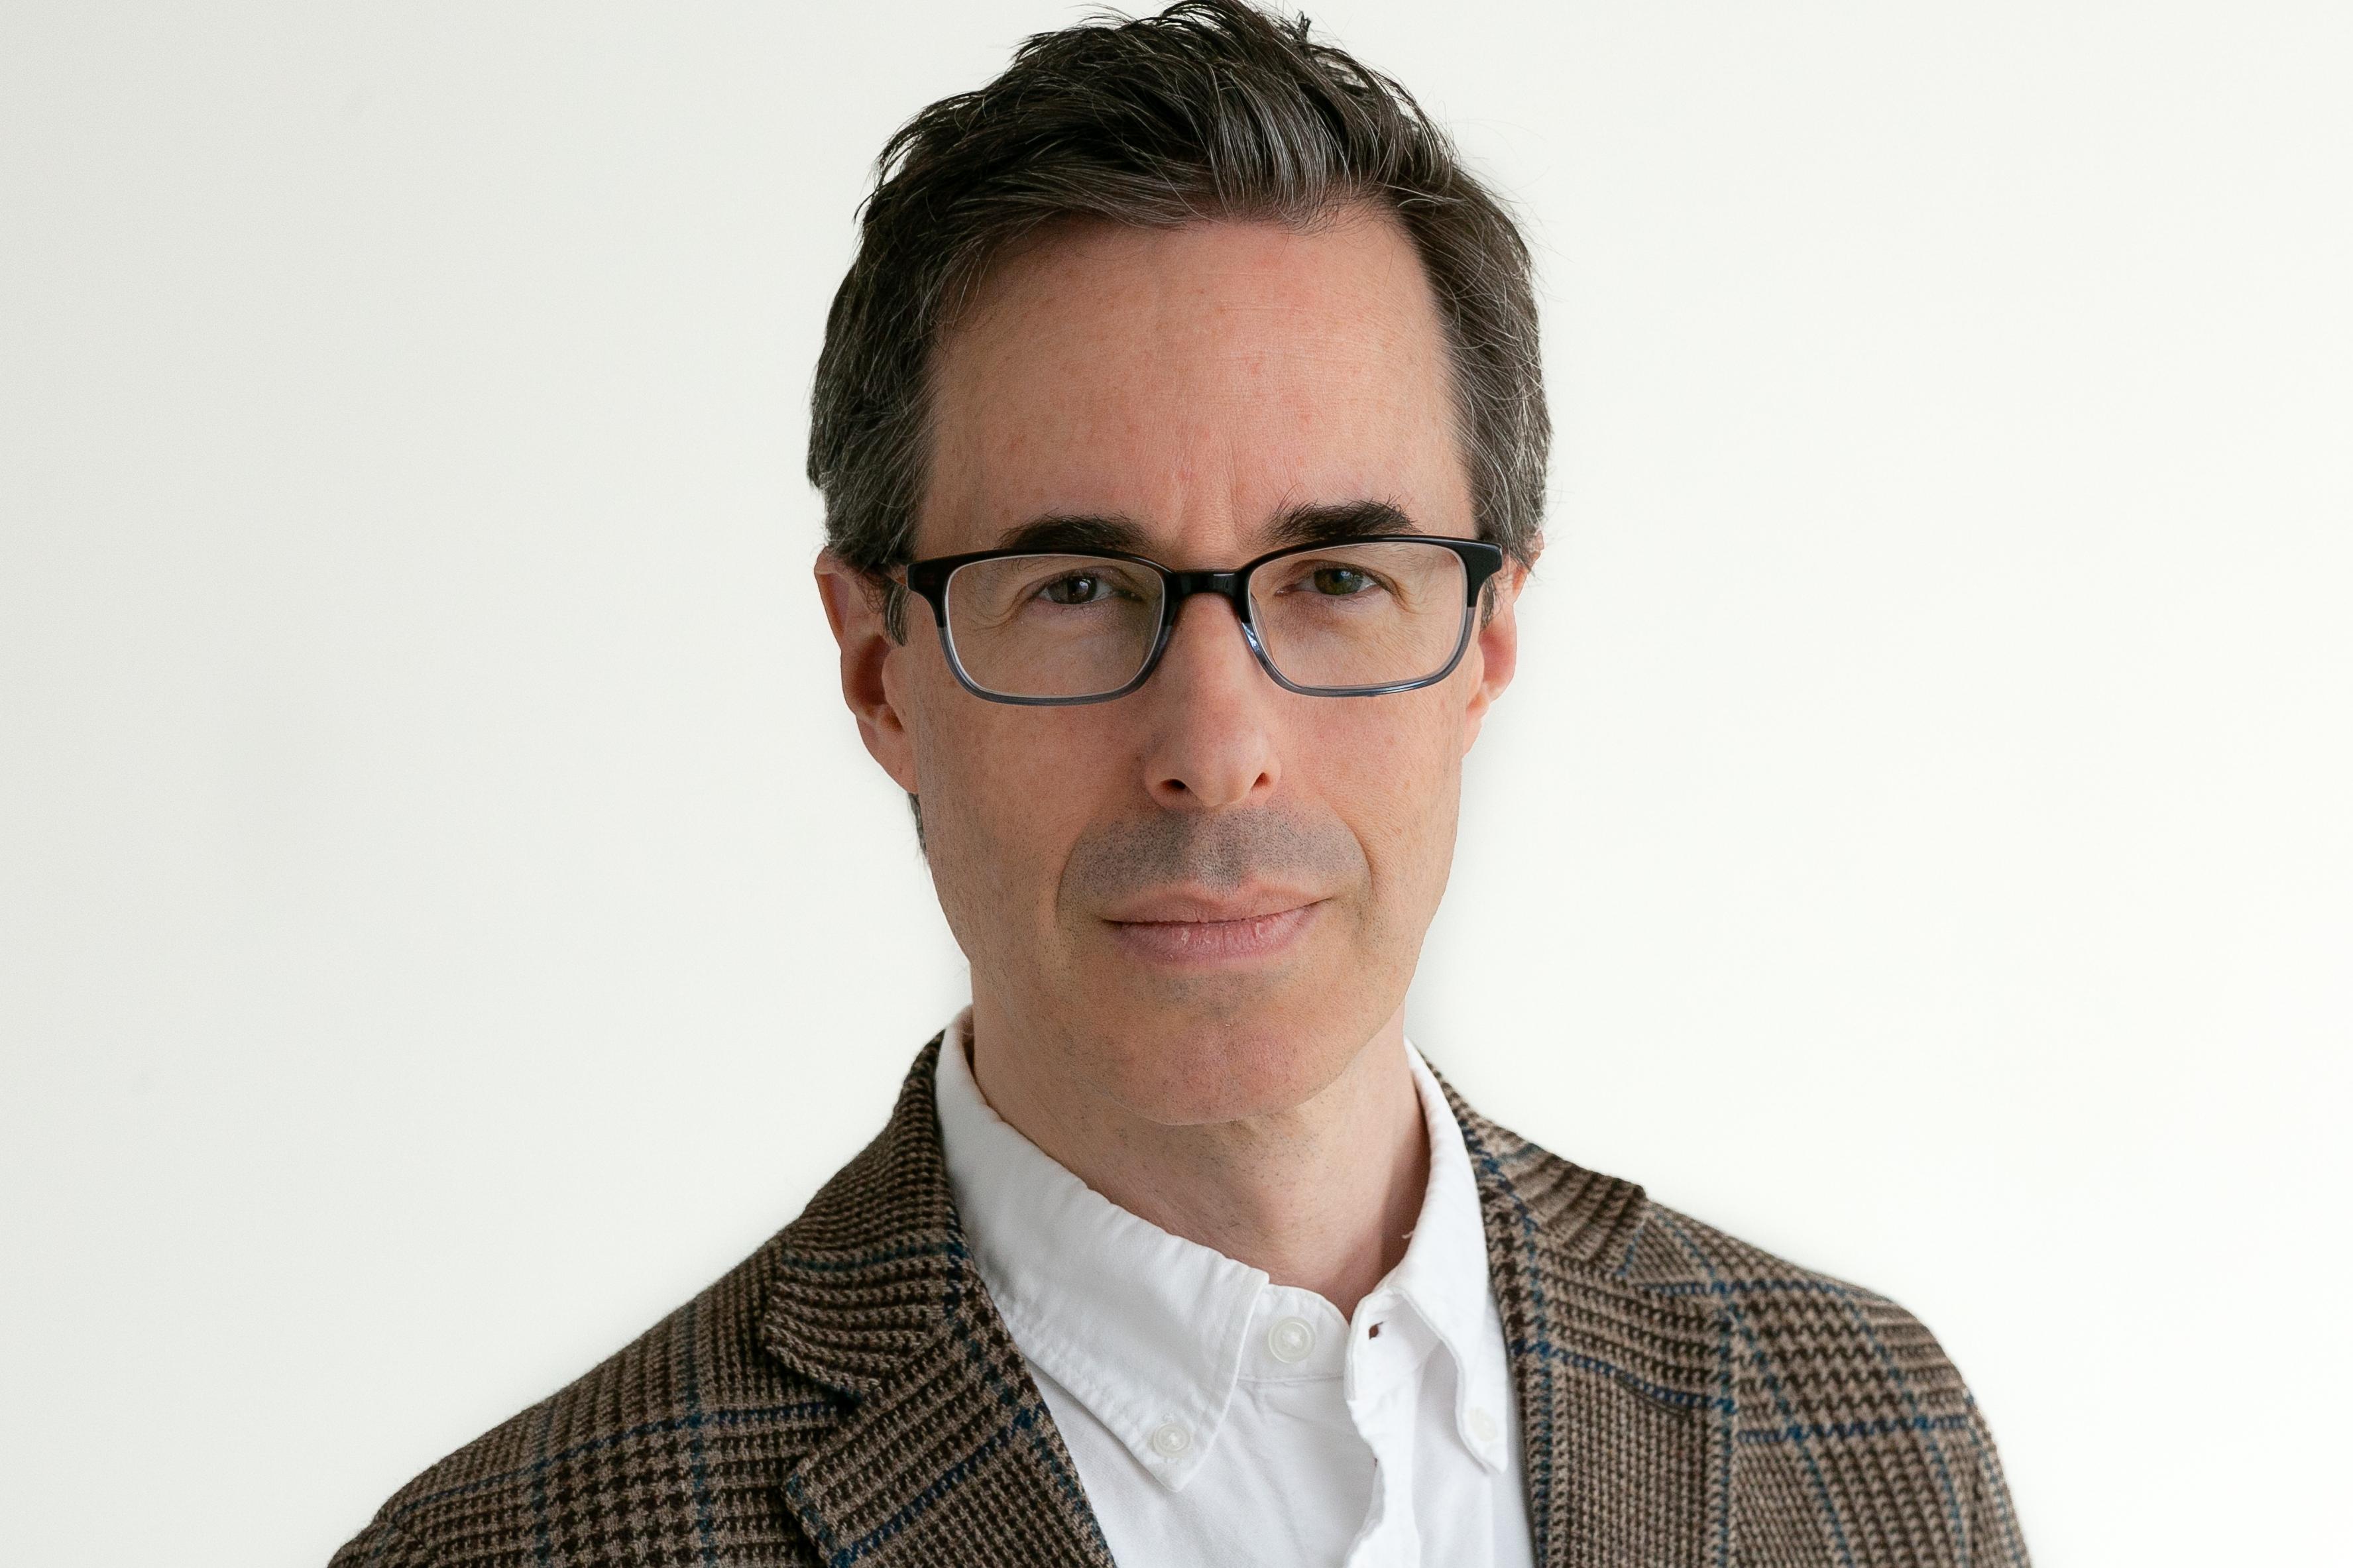 Simon Houpt